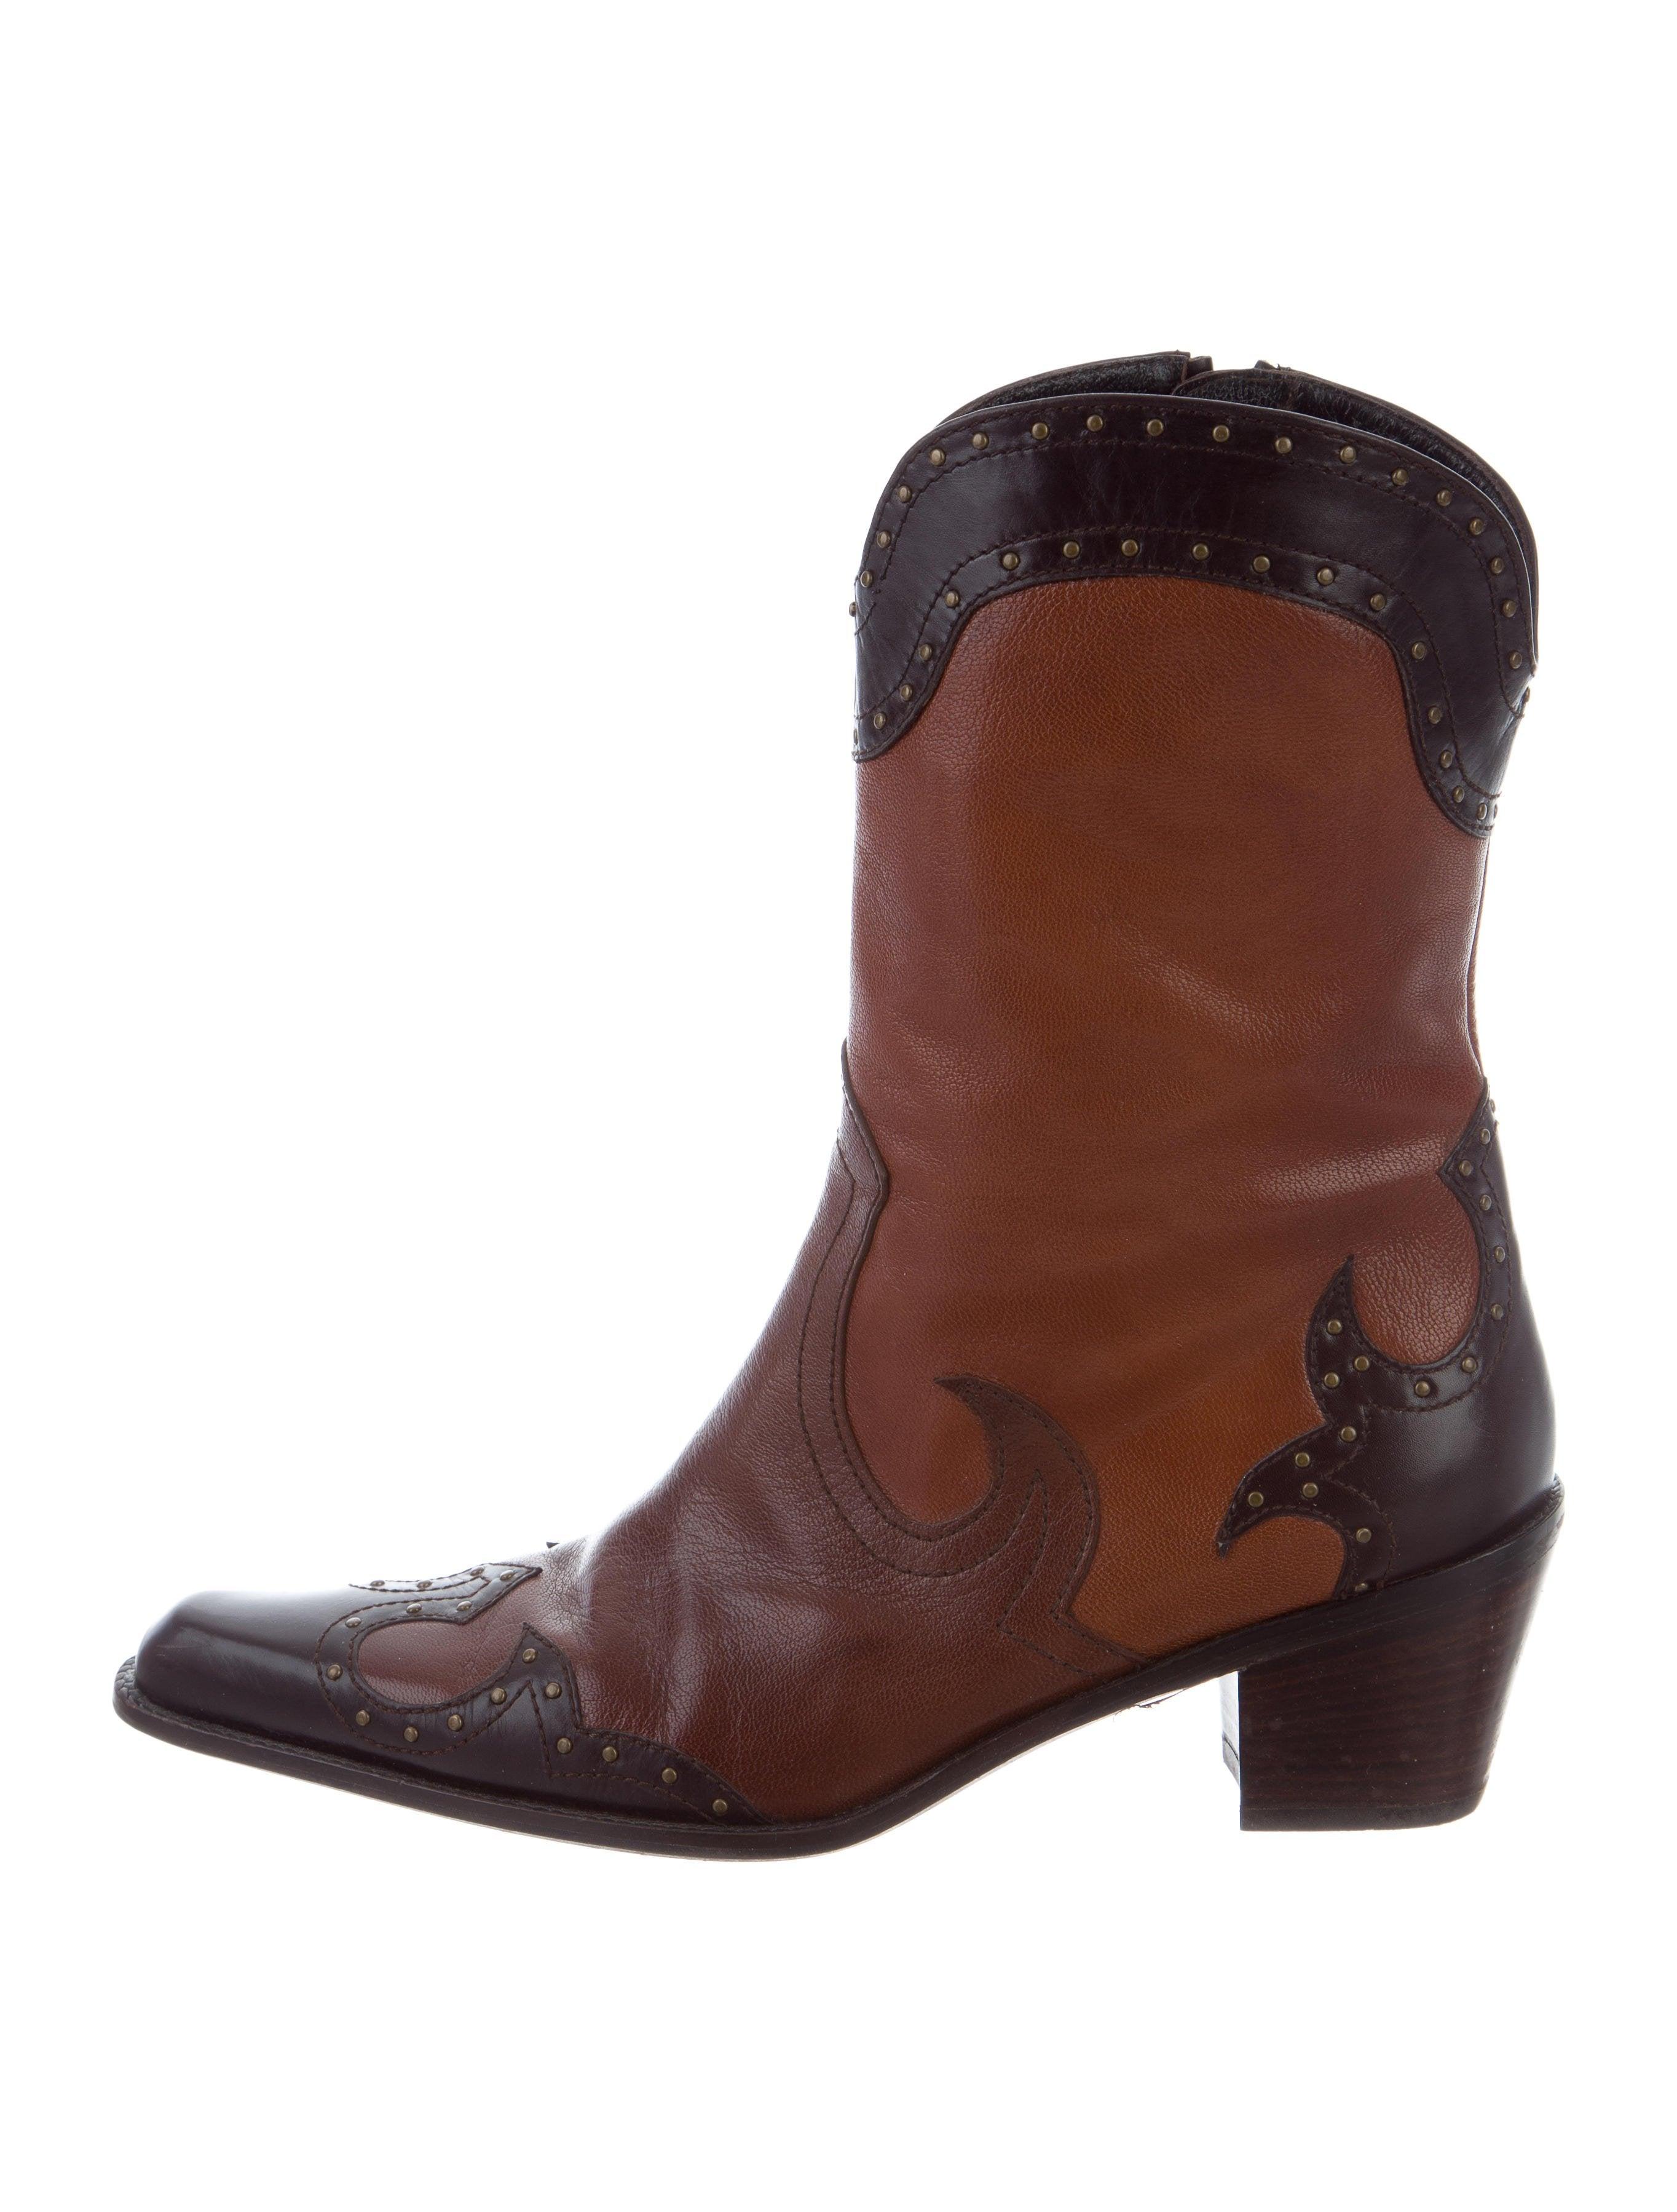 Stuart Weitzman Leather Cowboy Boots Shoes Wsu36526